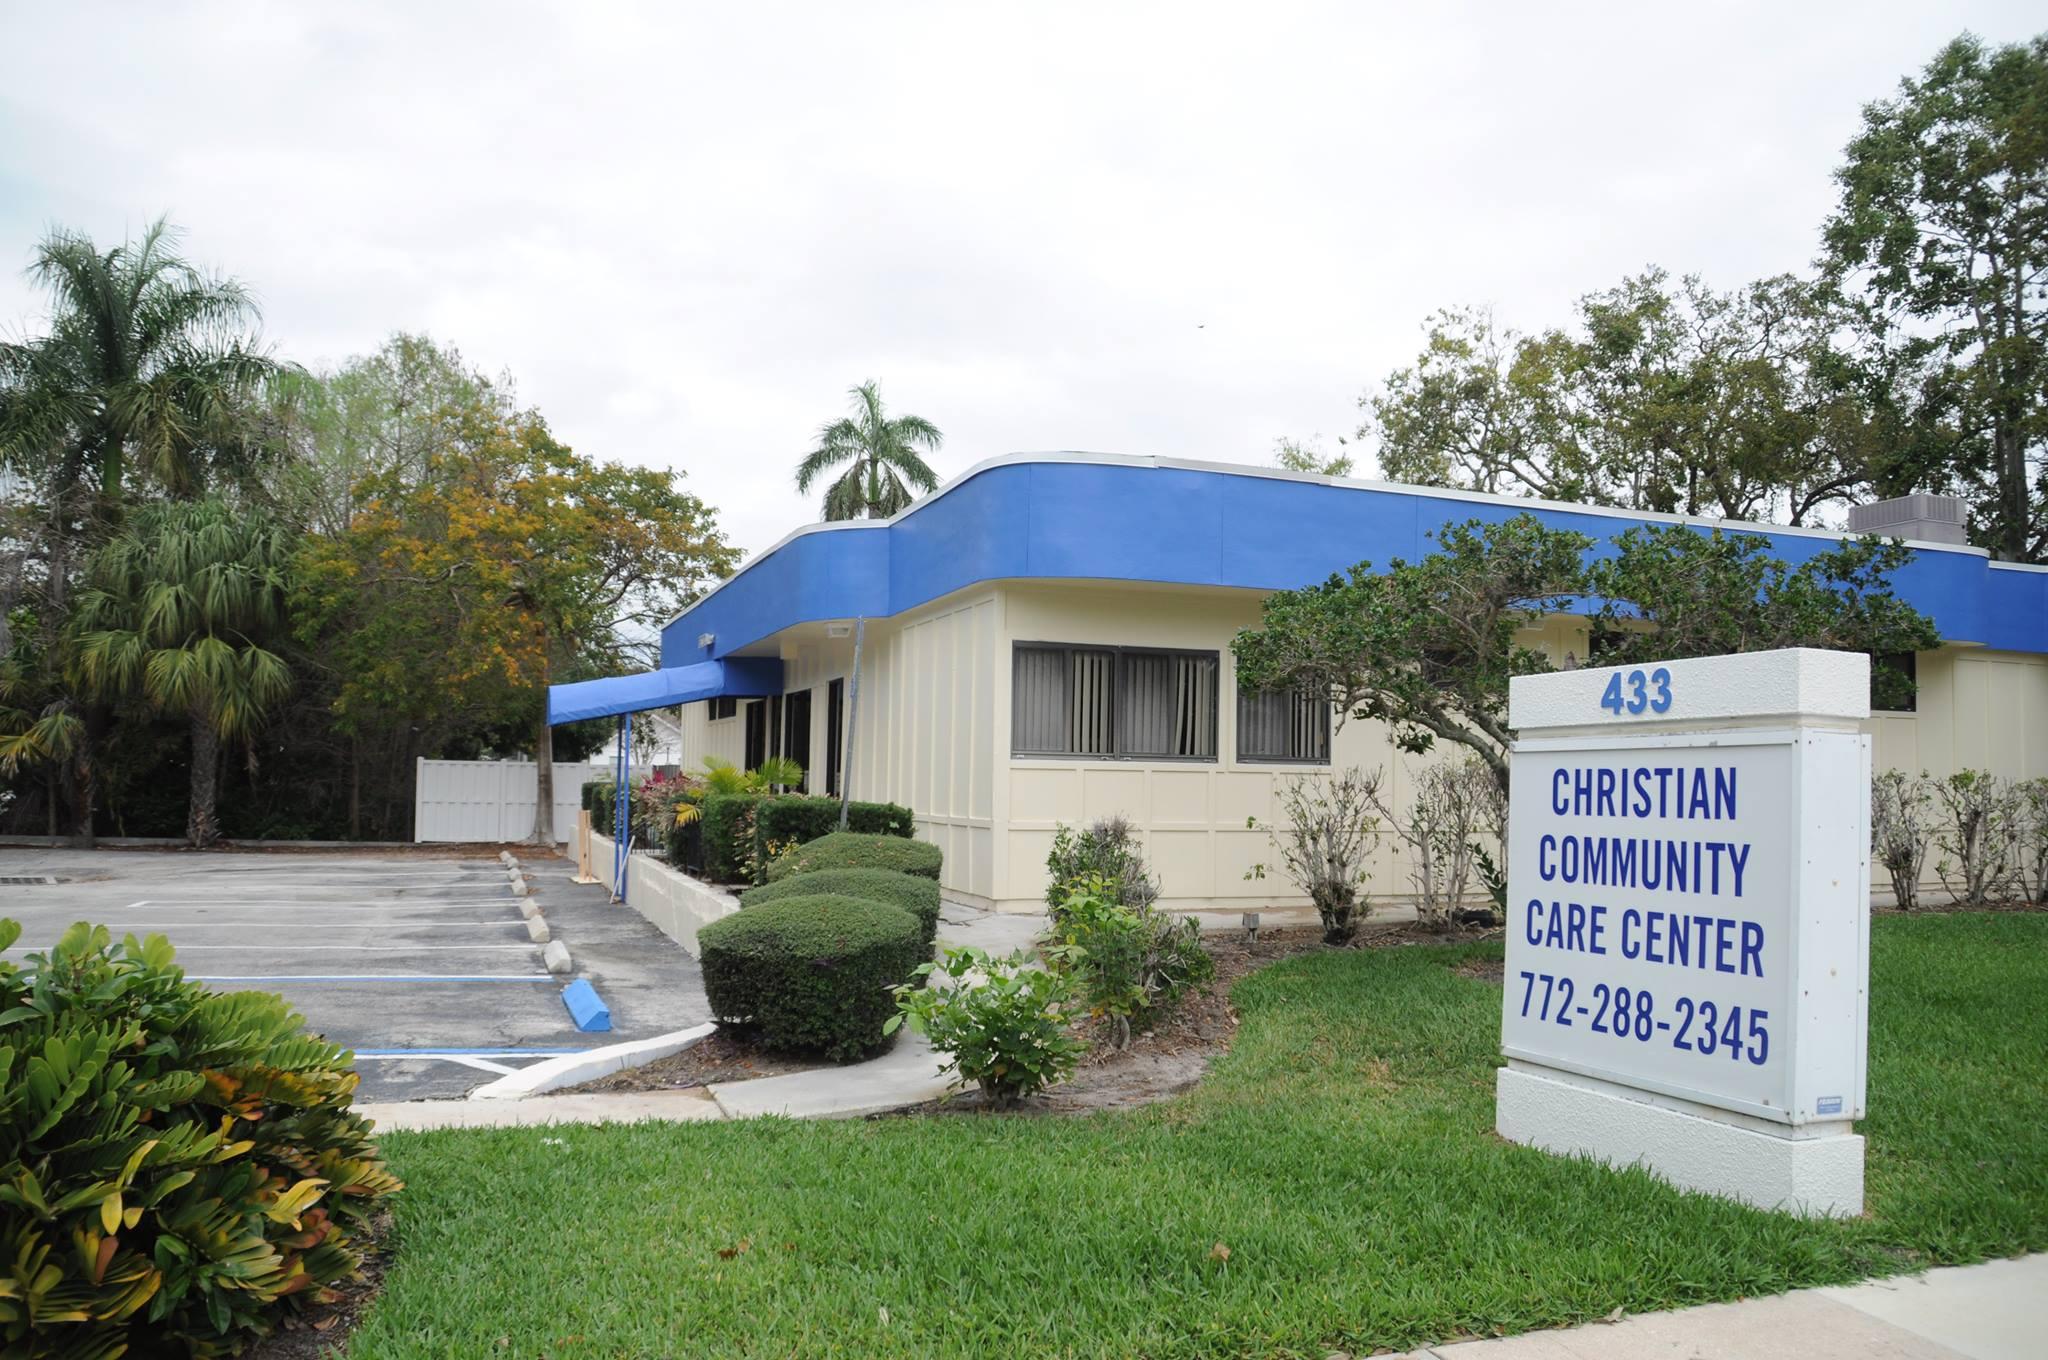 Christrain Community Center